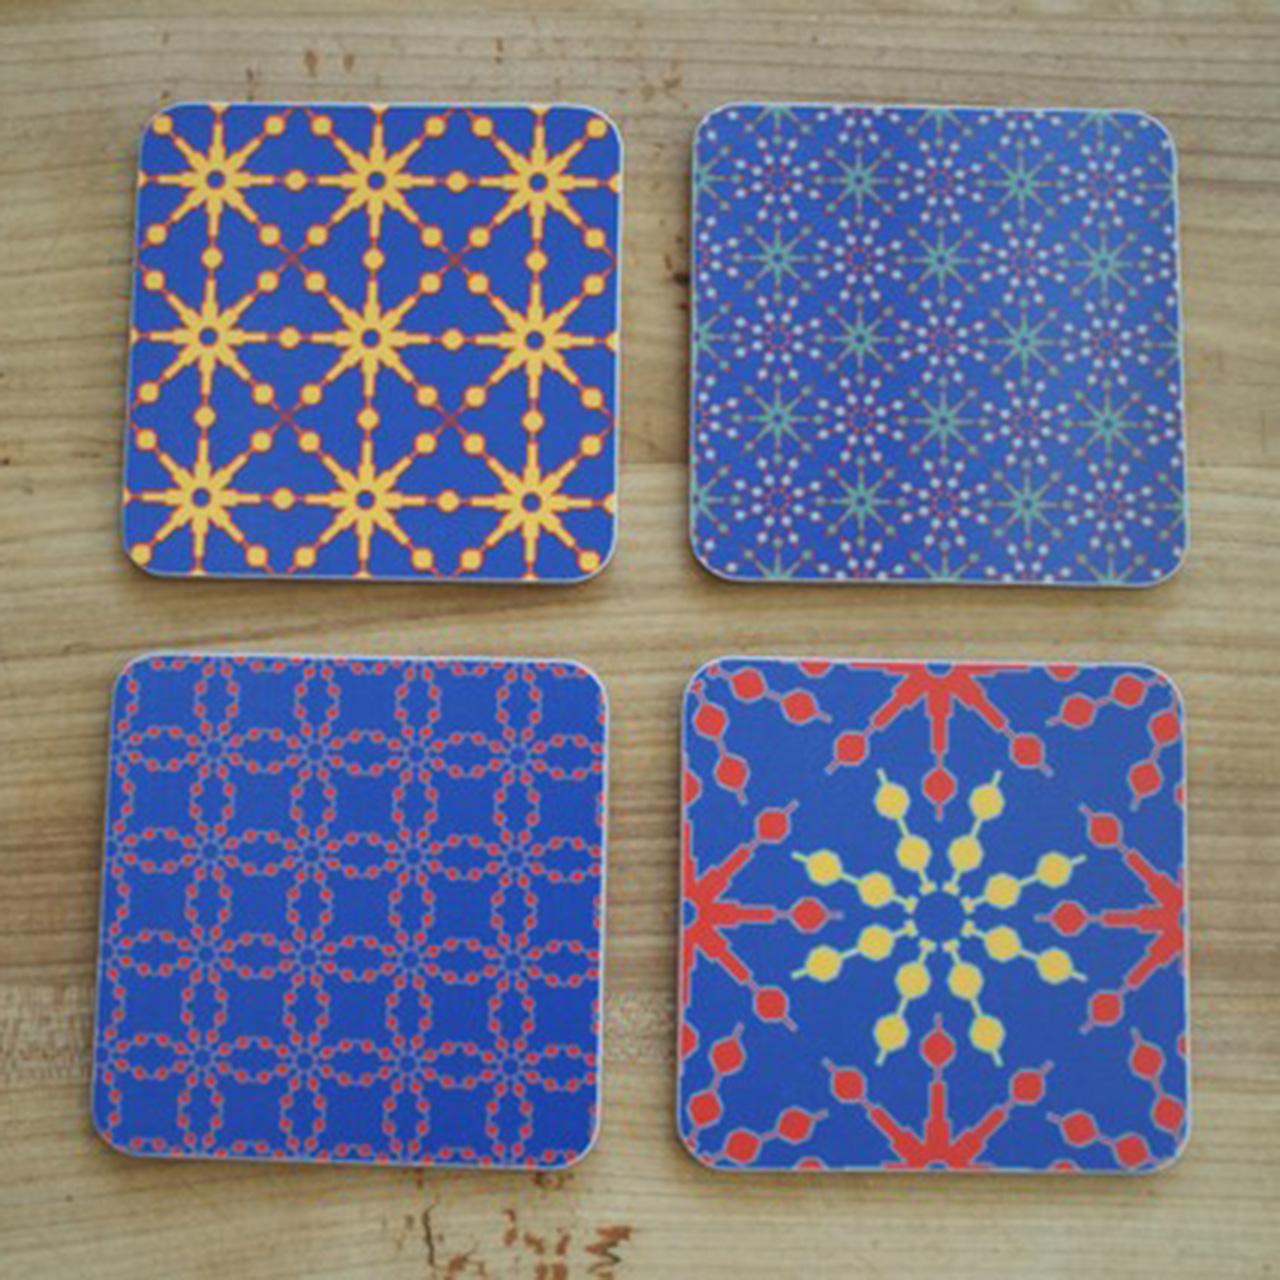 4er Set Coaster / Untersetzer Azulejo blau